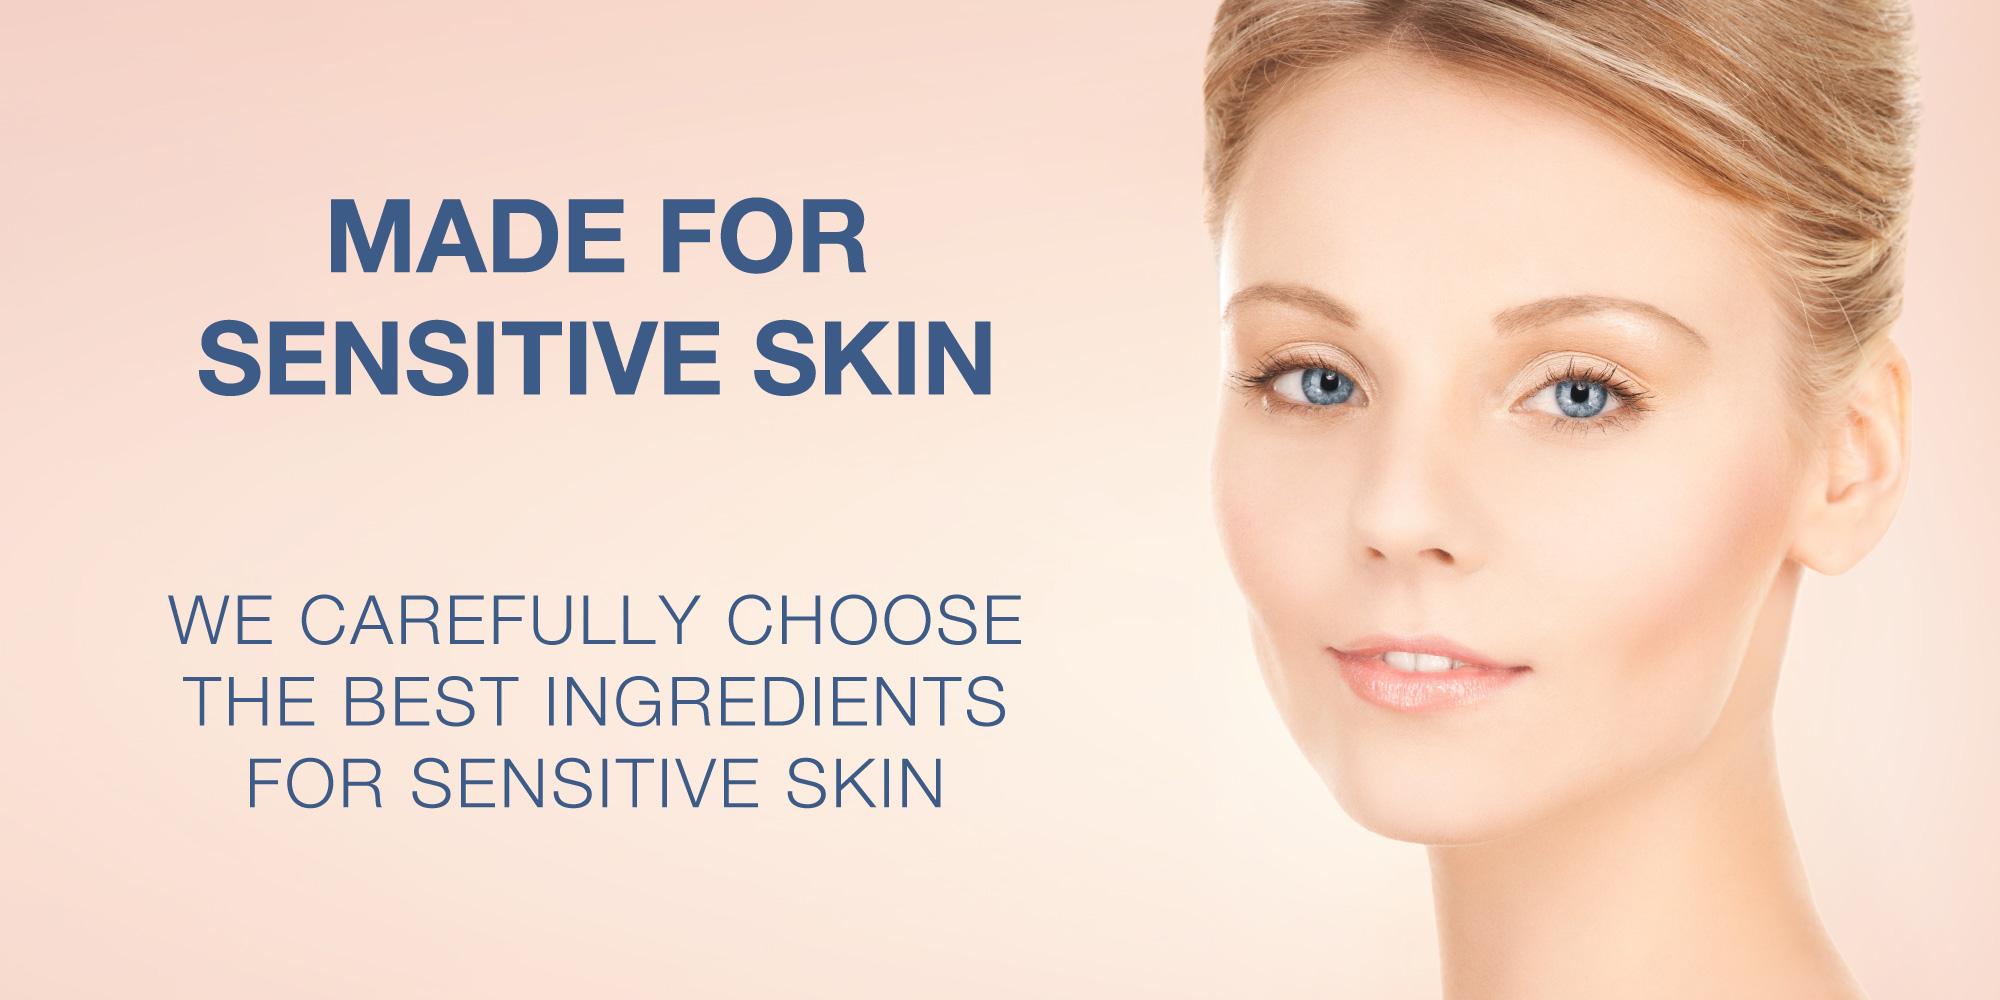 Made for sensitive skin - We carefully choose the best ingredients for sensitive skin